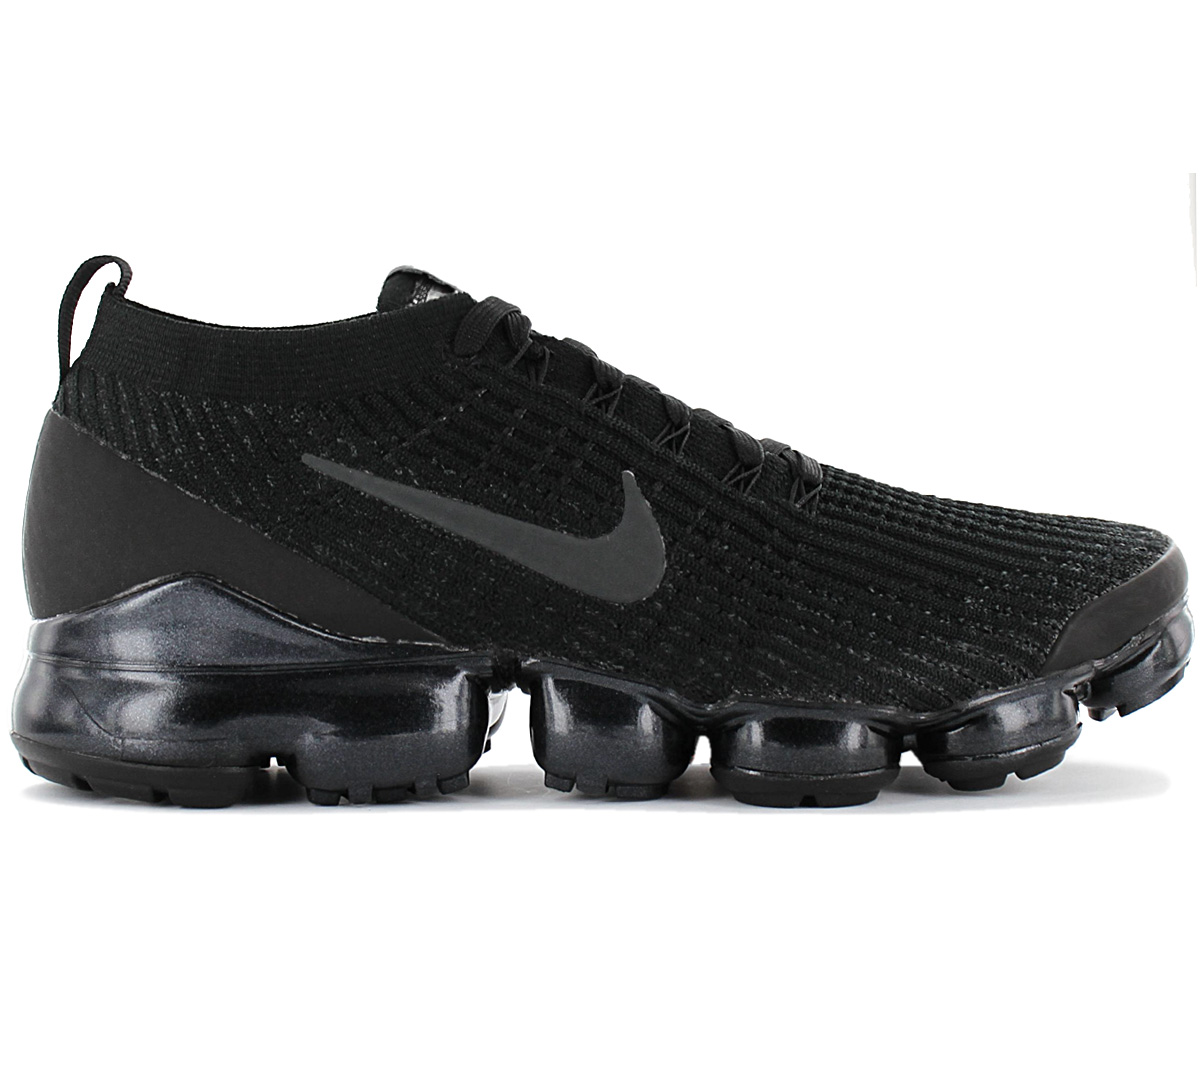 Details zu Nike Air VaporMax Flyknit 3 Herren Sneaker AJ6900 004 Schwarz Schuhe Turnschuhe